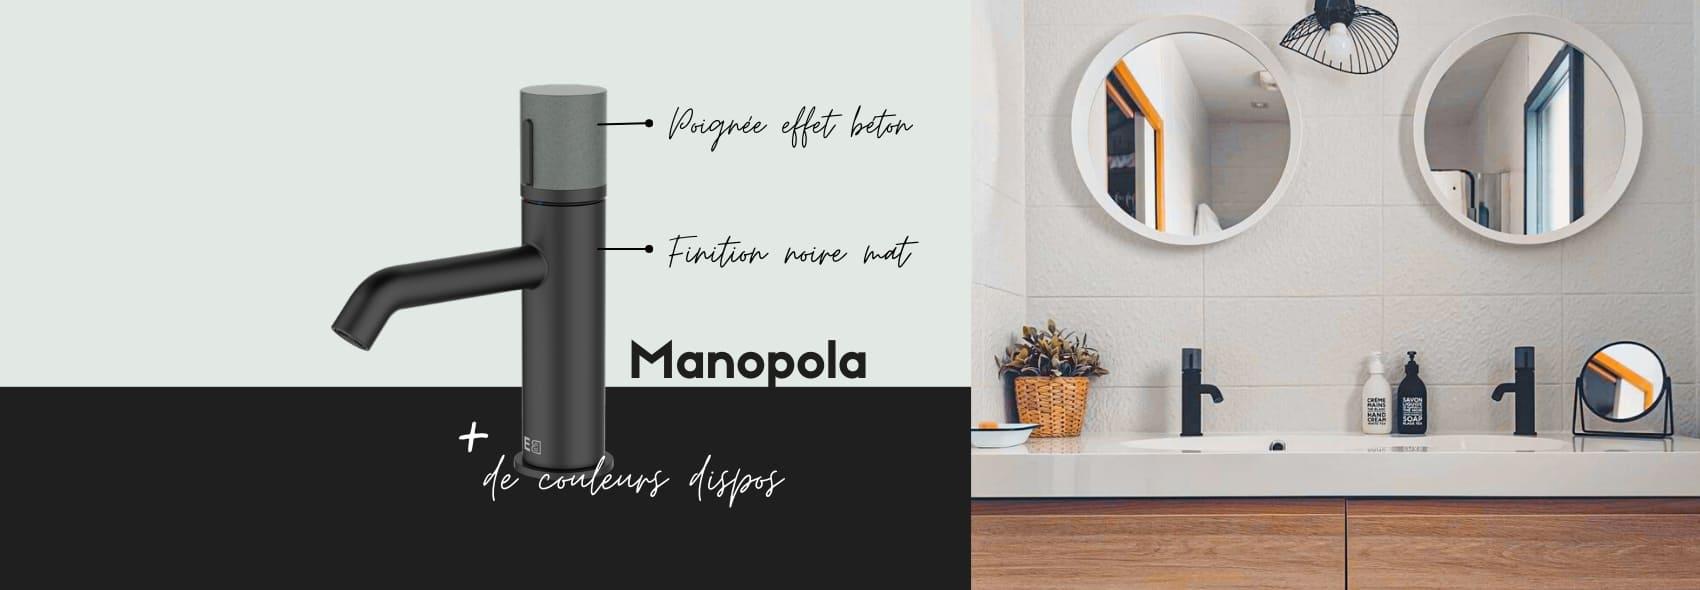 Collection Manopola